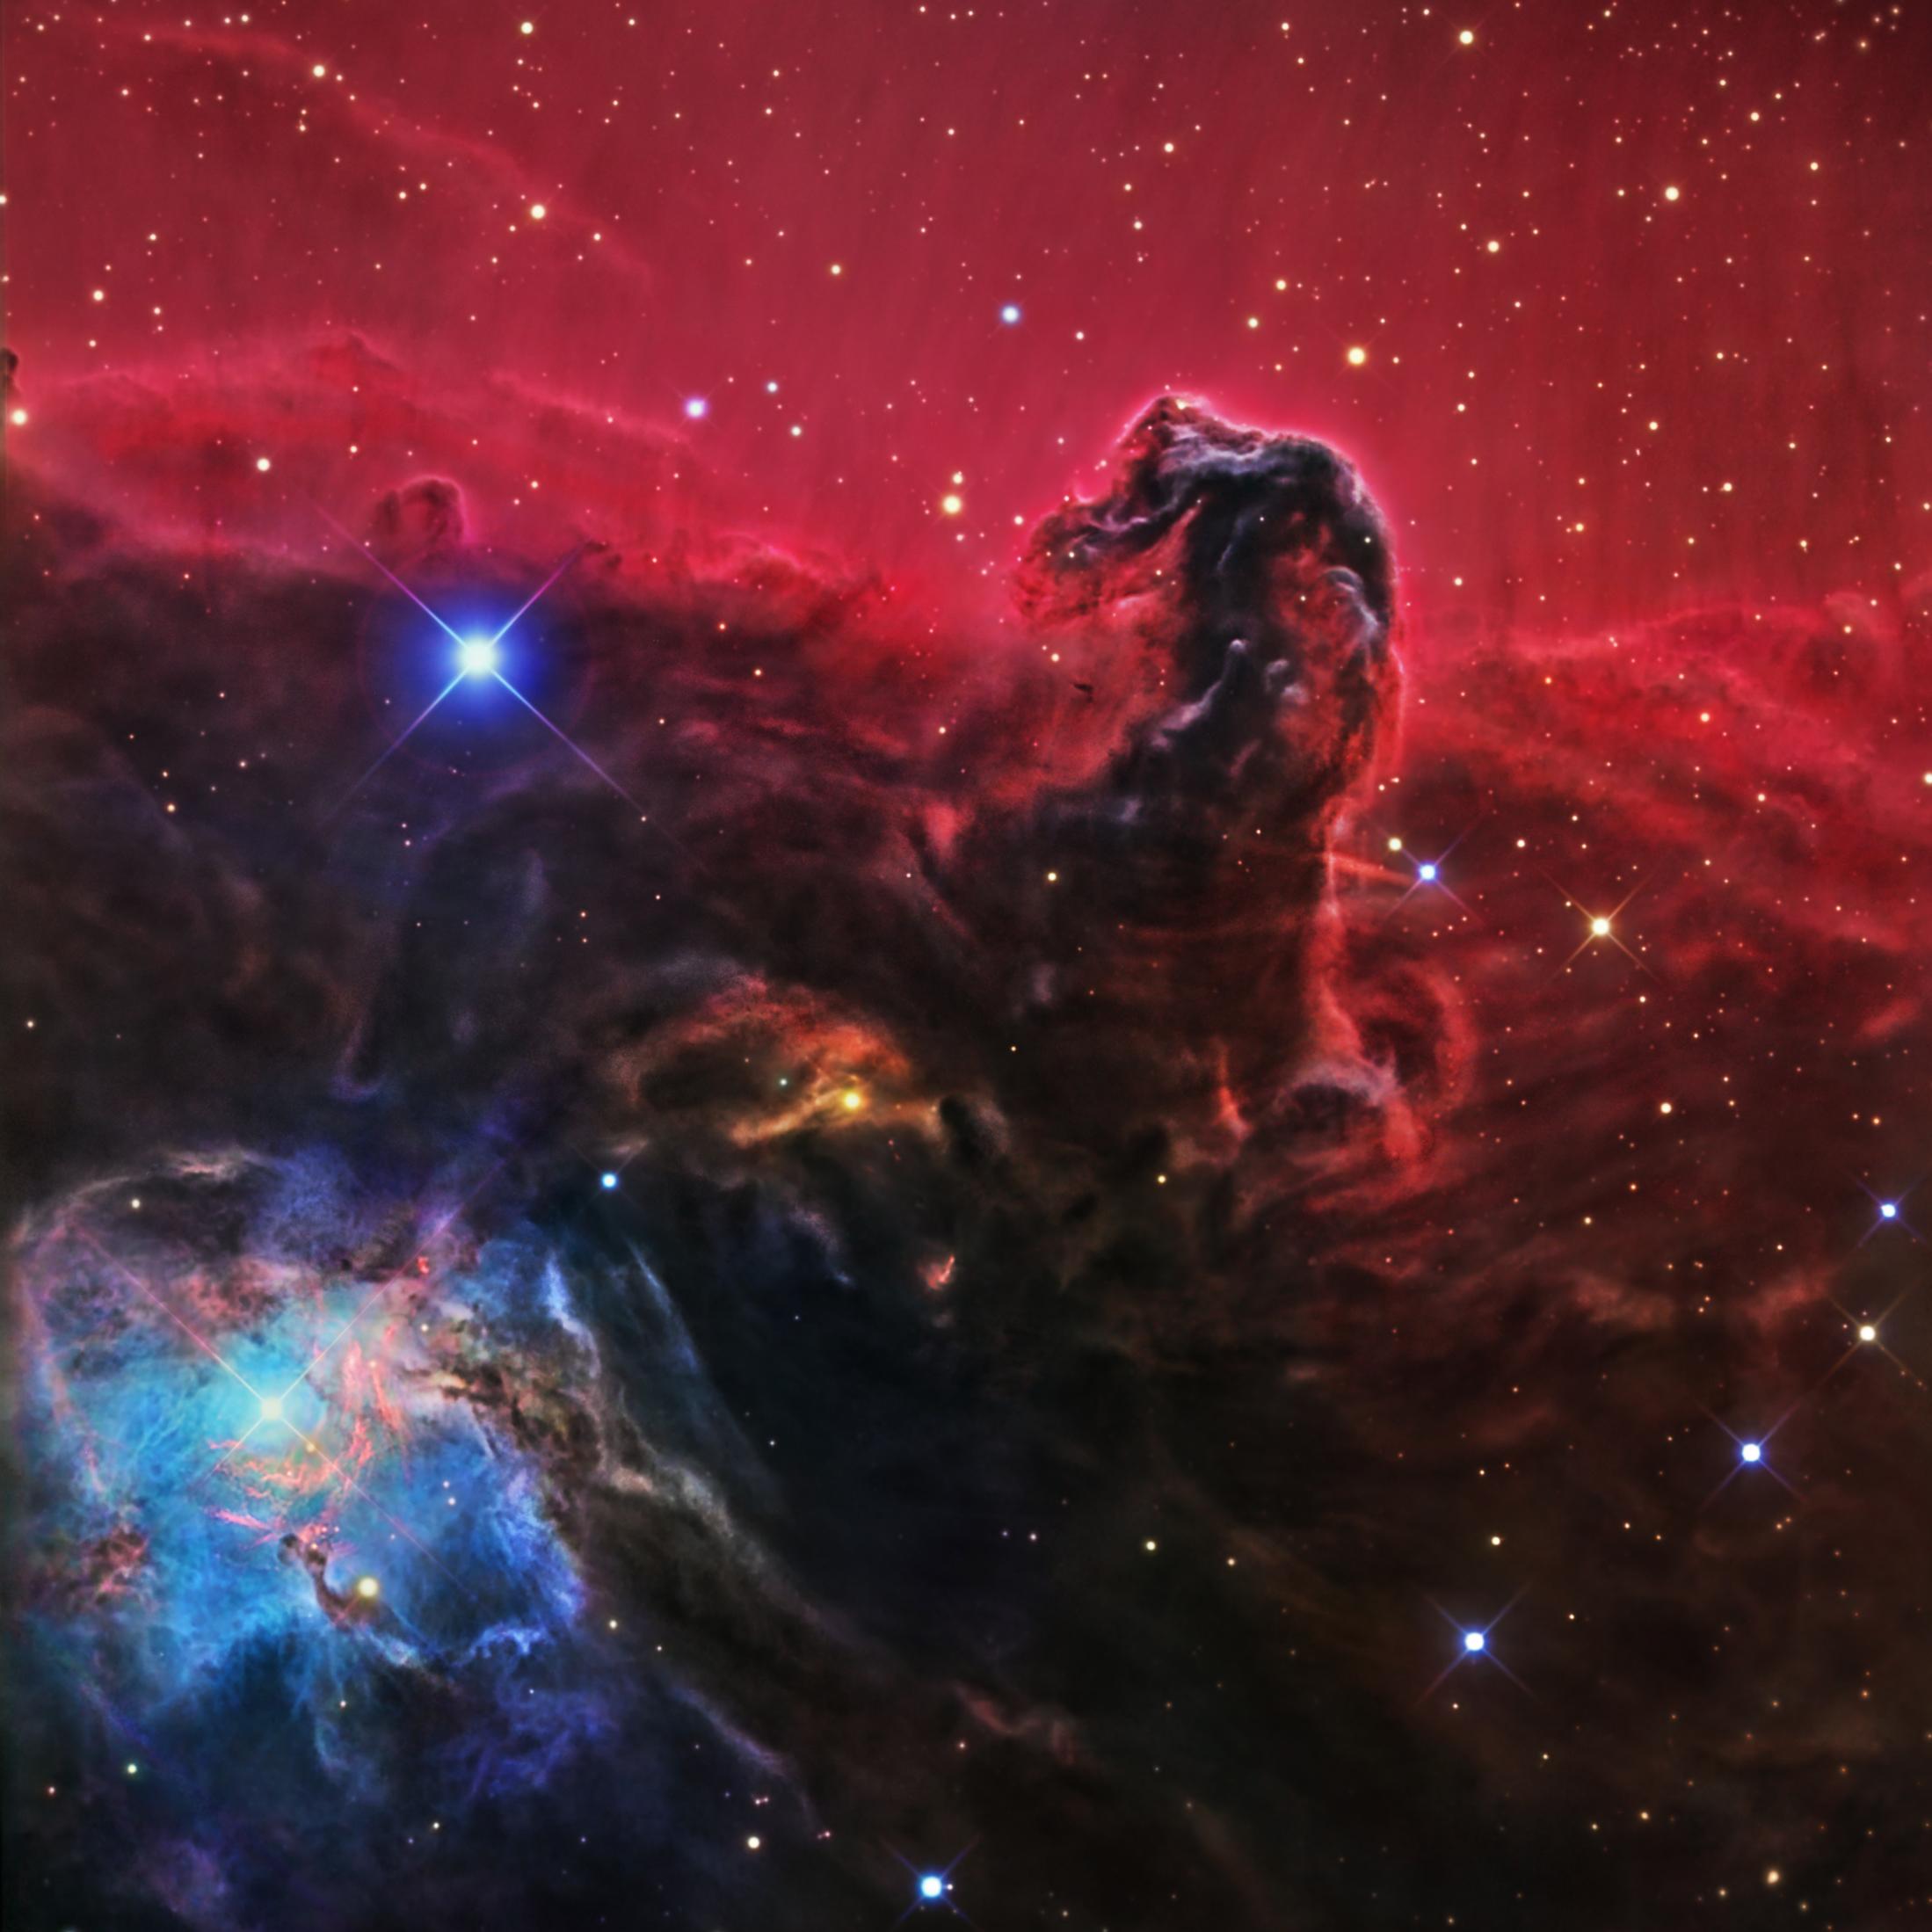 nebula in orion the horsehead nebula - photo #16